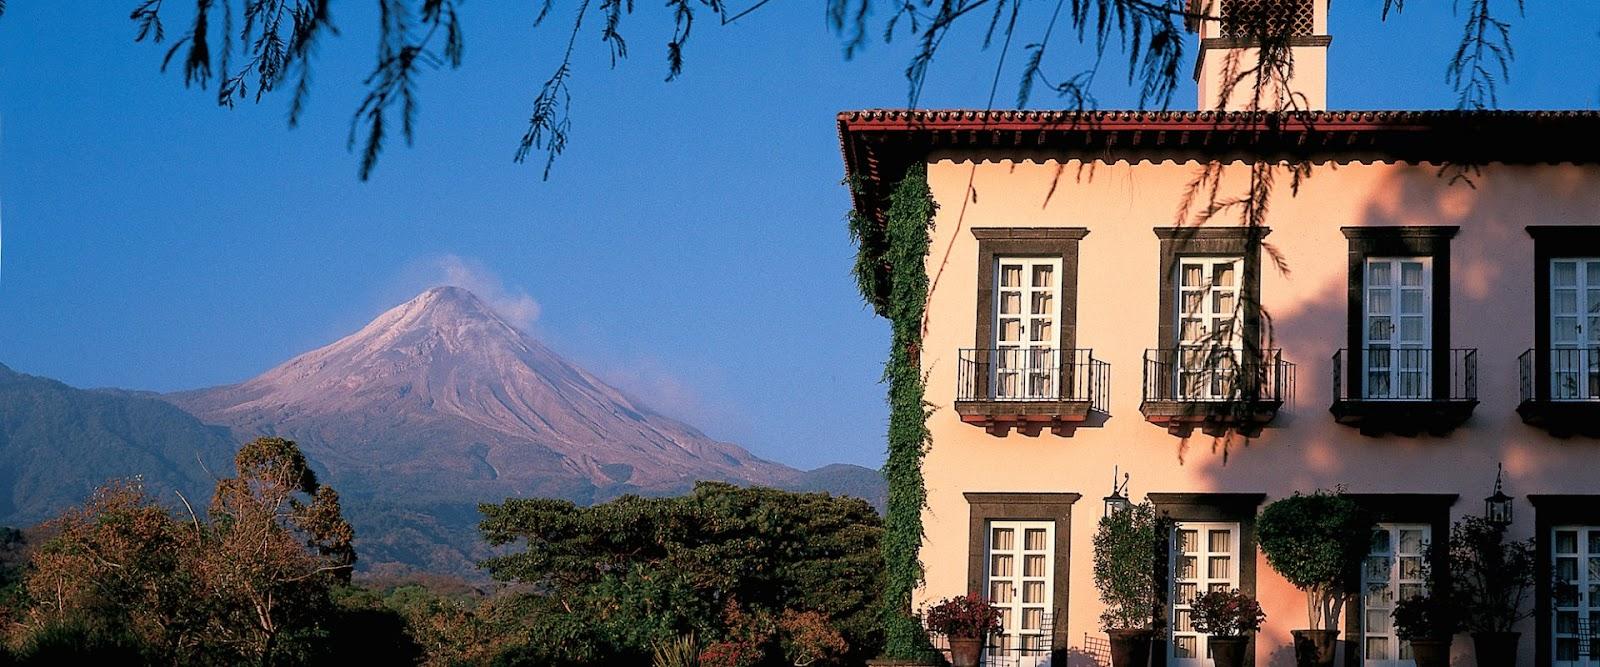 hacienda_de_san_antonio_colima_mexico_412-1920x800.jpg